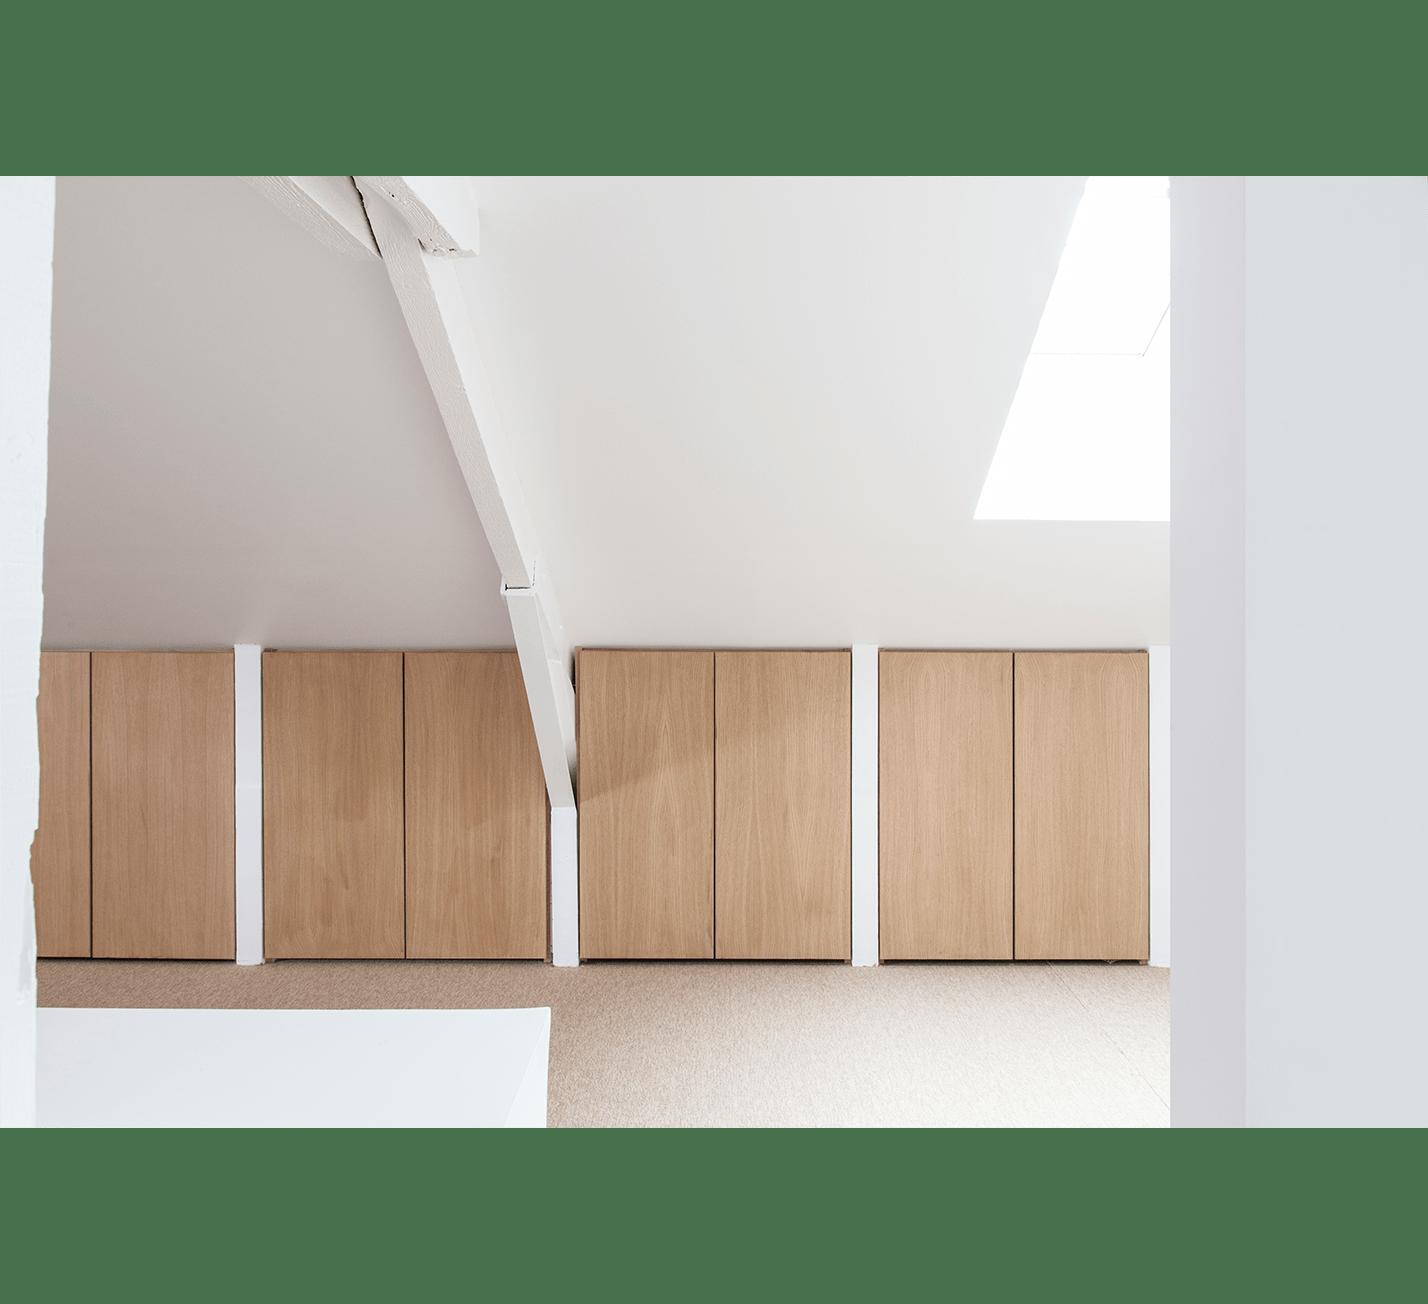 Projet-Germaine-Atelier-Steve-Pauline-Borgia-Architecte-interieur-09-min